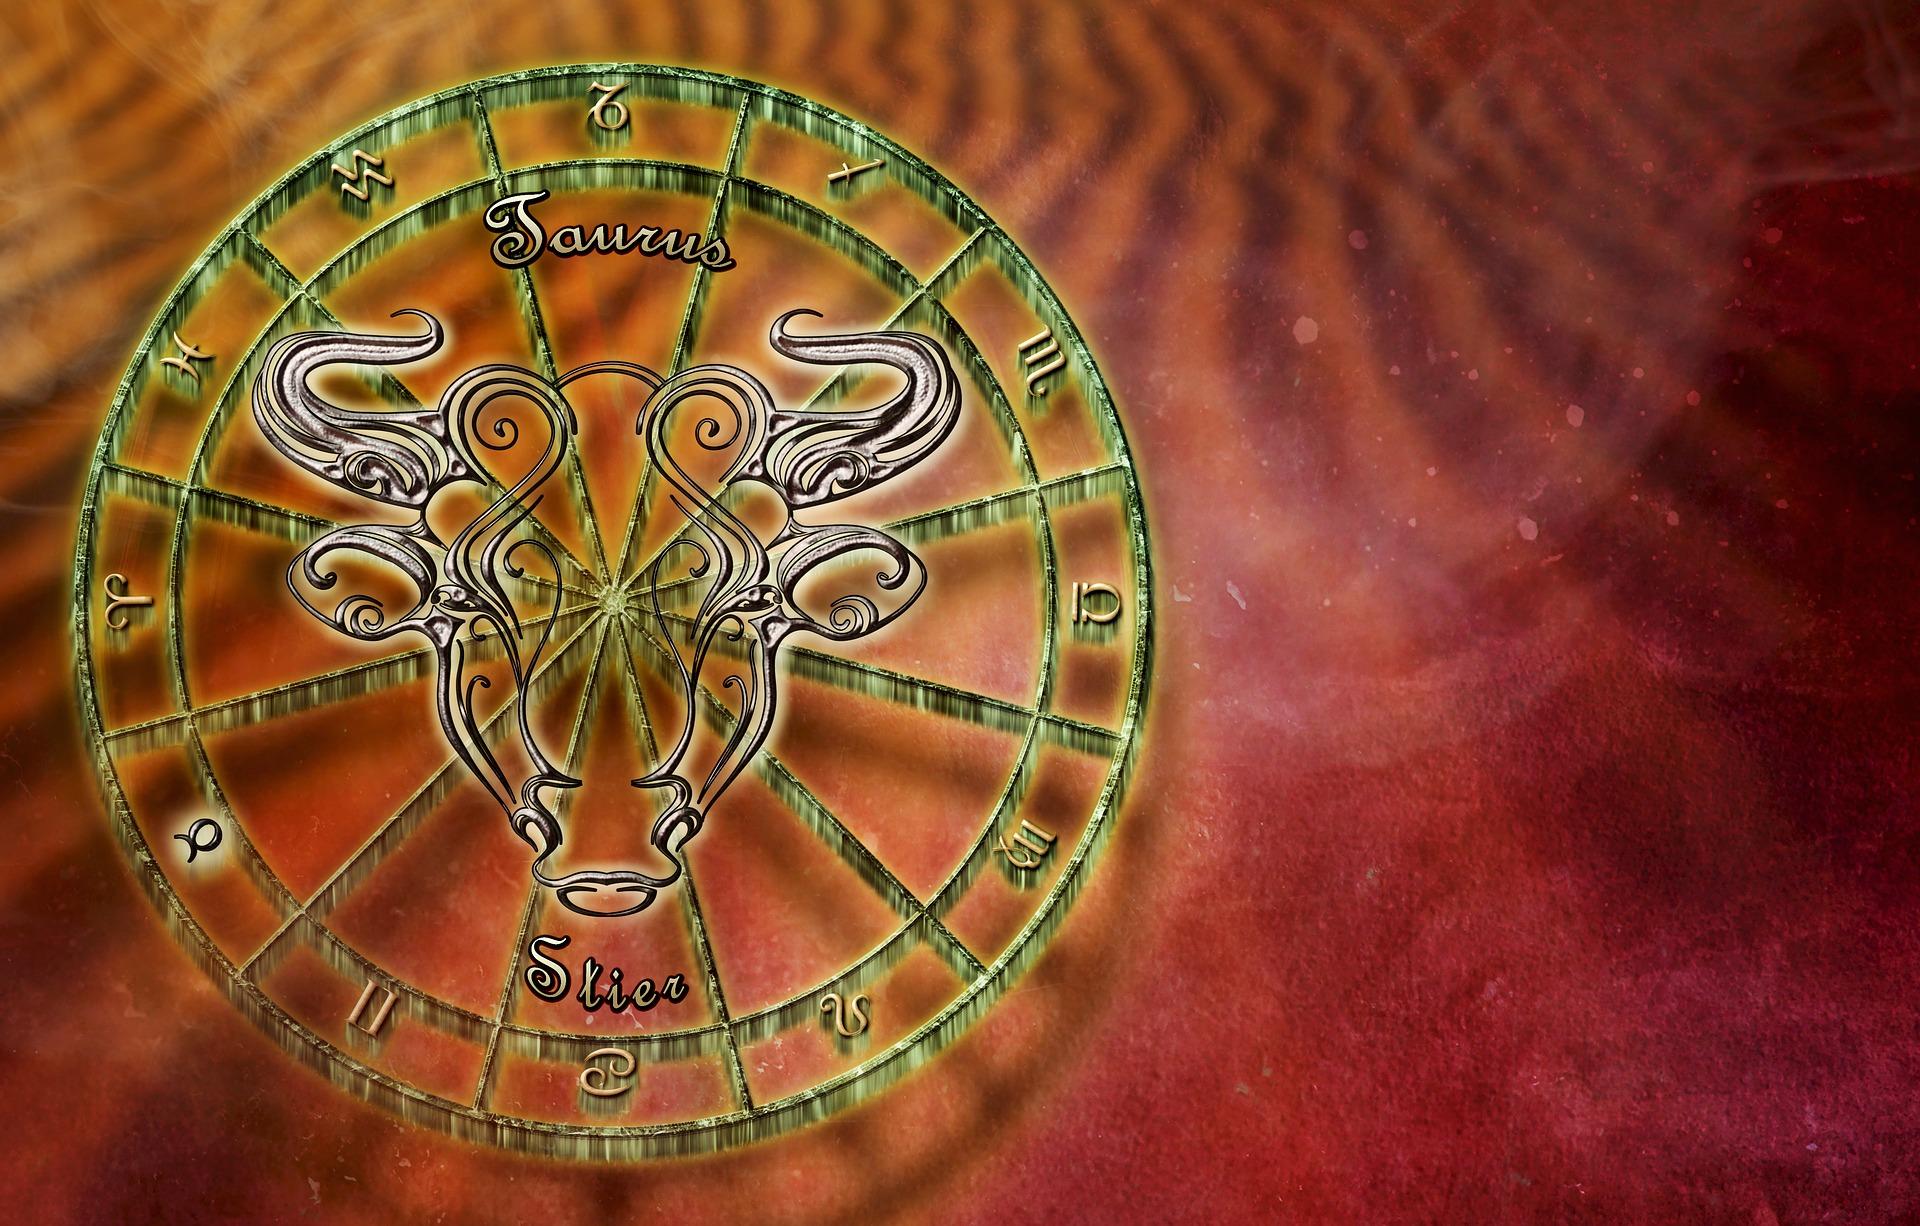 Taurus free horoscope 2019 - Barbara's Psychic Mediums